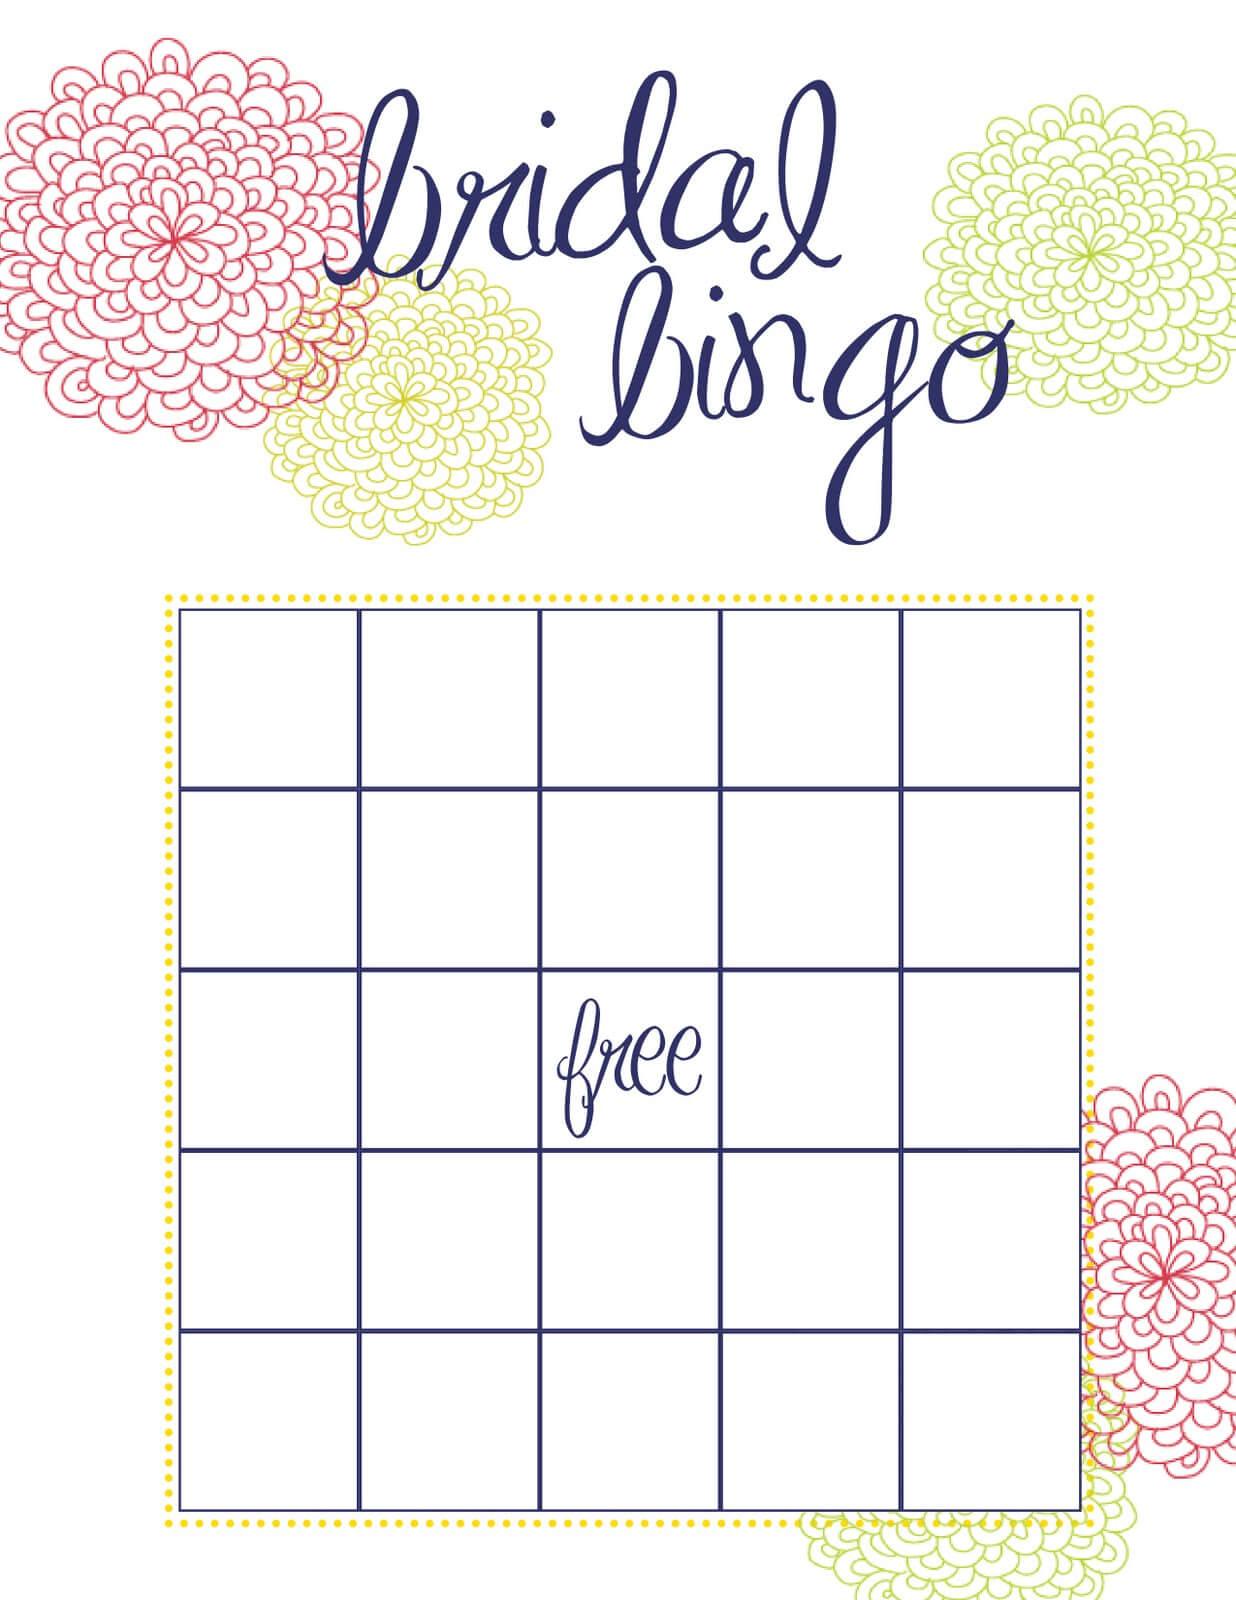 Free Bridal Bingo Template ] - Bridal Shower Bingo Template Throughout Blank Bridal Shower Bingo Template